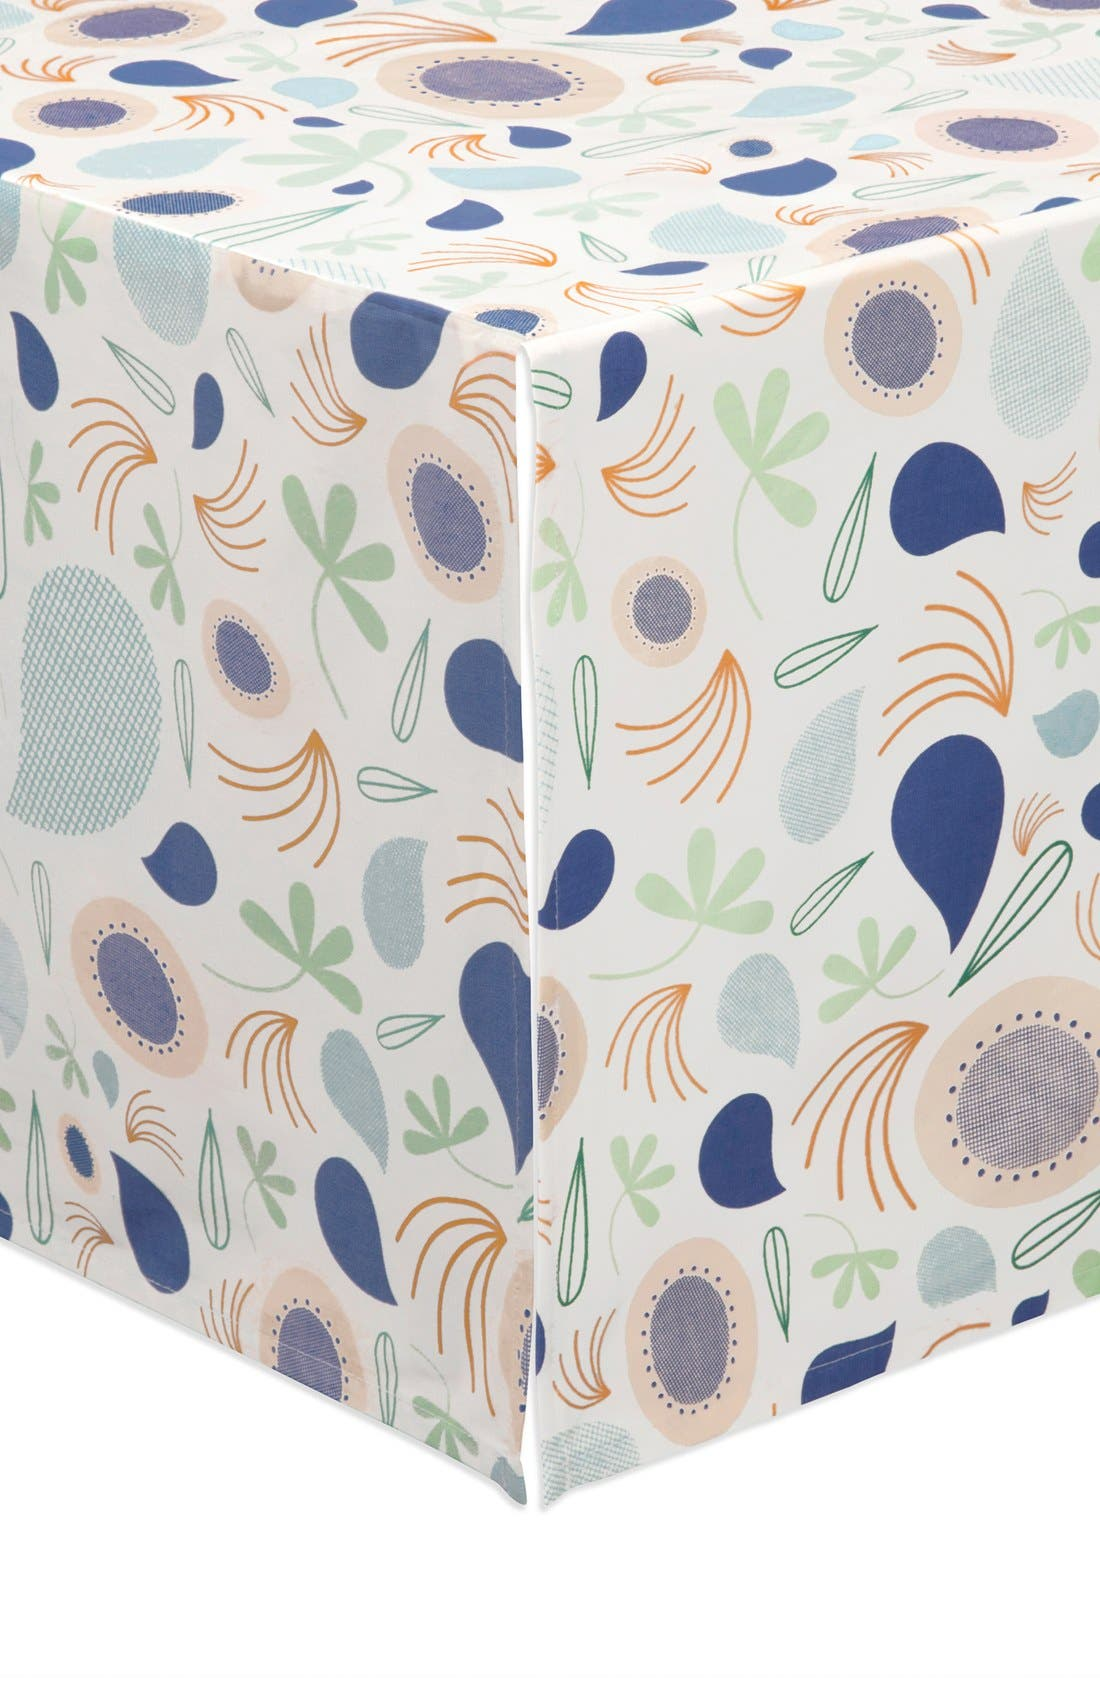 'Flora' Crib Sheet, Crib Skirt, Stroller Blanket & Wall Decals,                             Alternate thumbnail 4, color,                             400